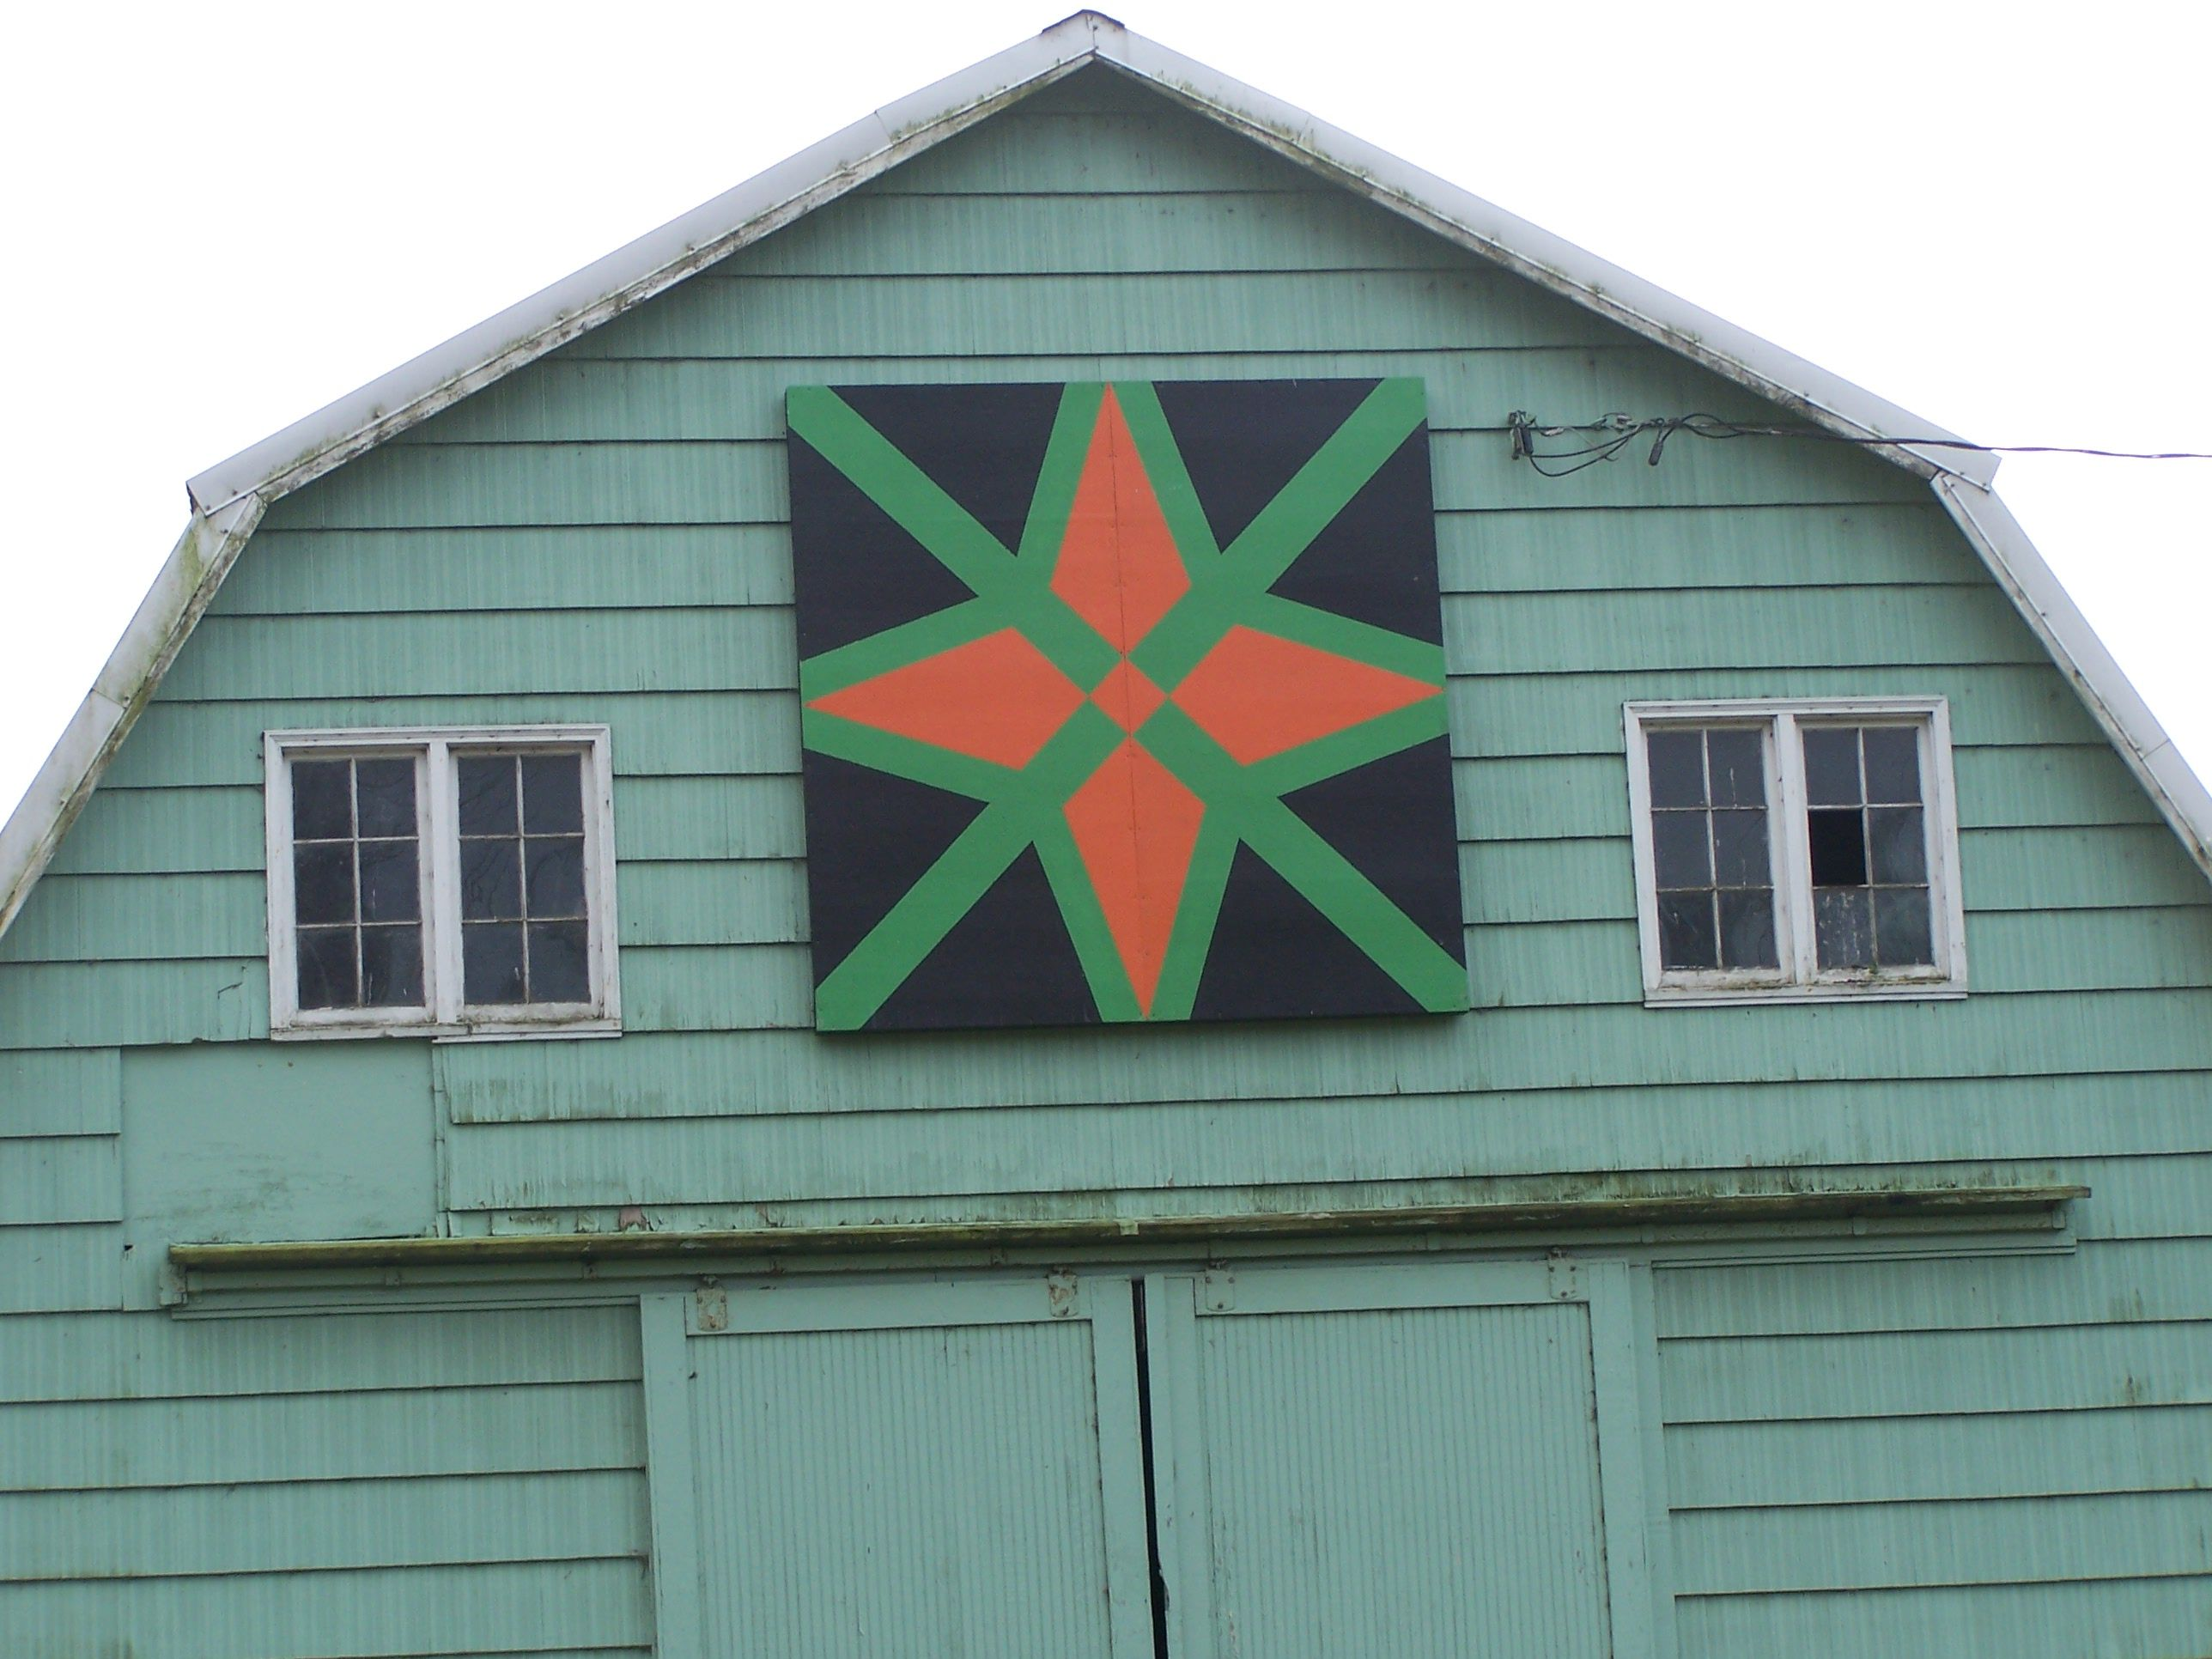 Tillamook, Oregon | Quilt Block on Barns | Pinterest | Oregon : tillamook quilt trail - Adamdwight.com